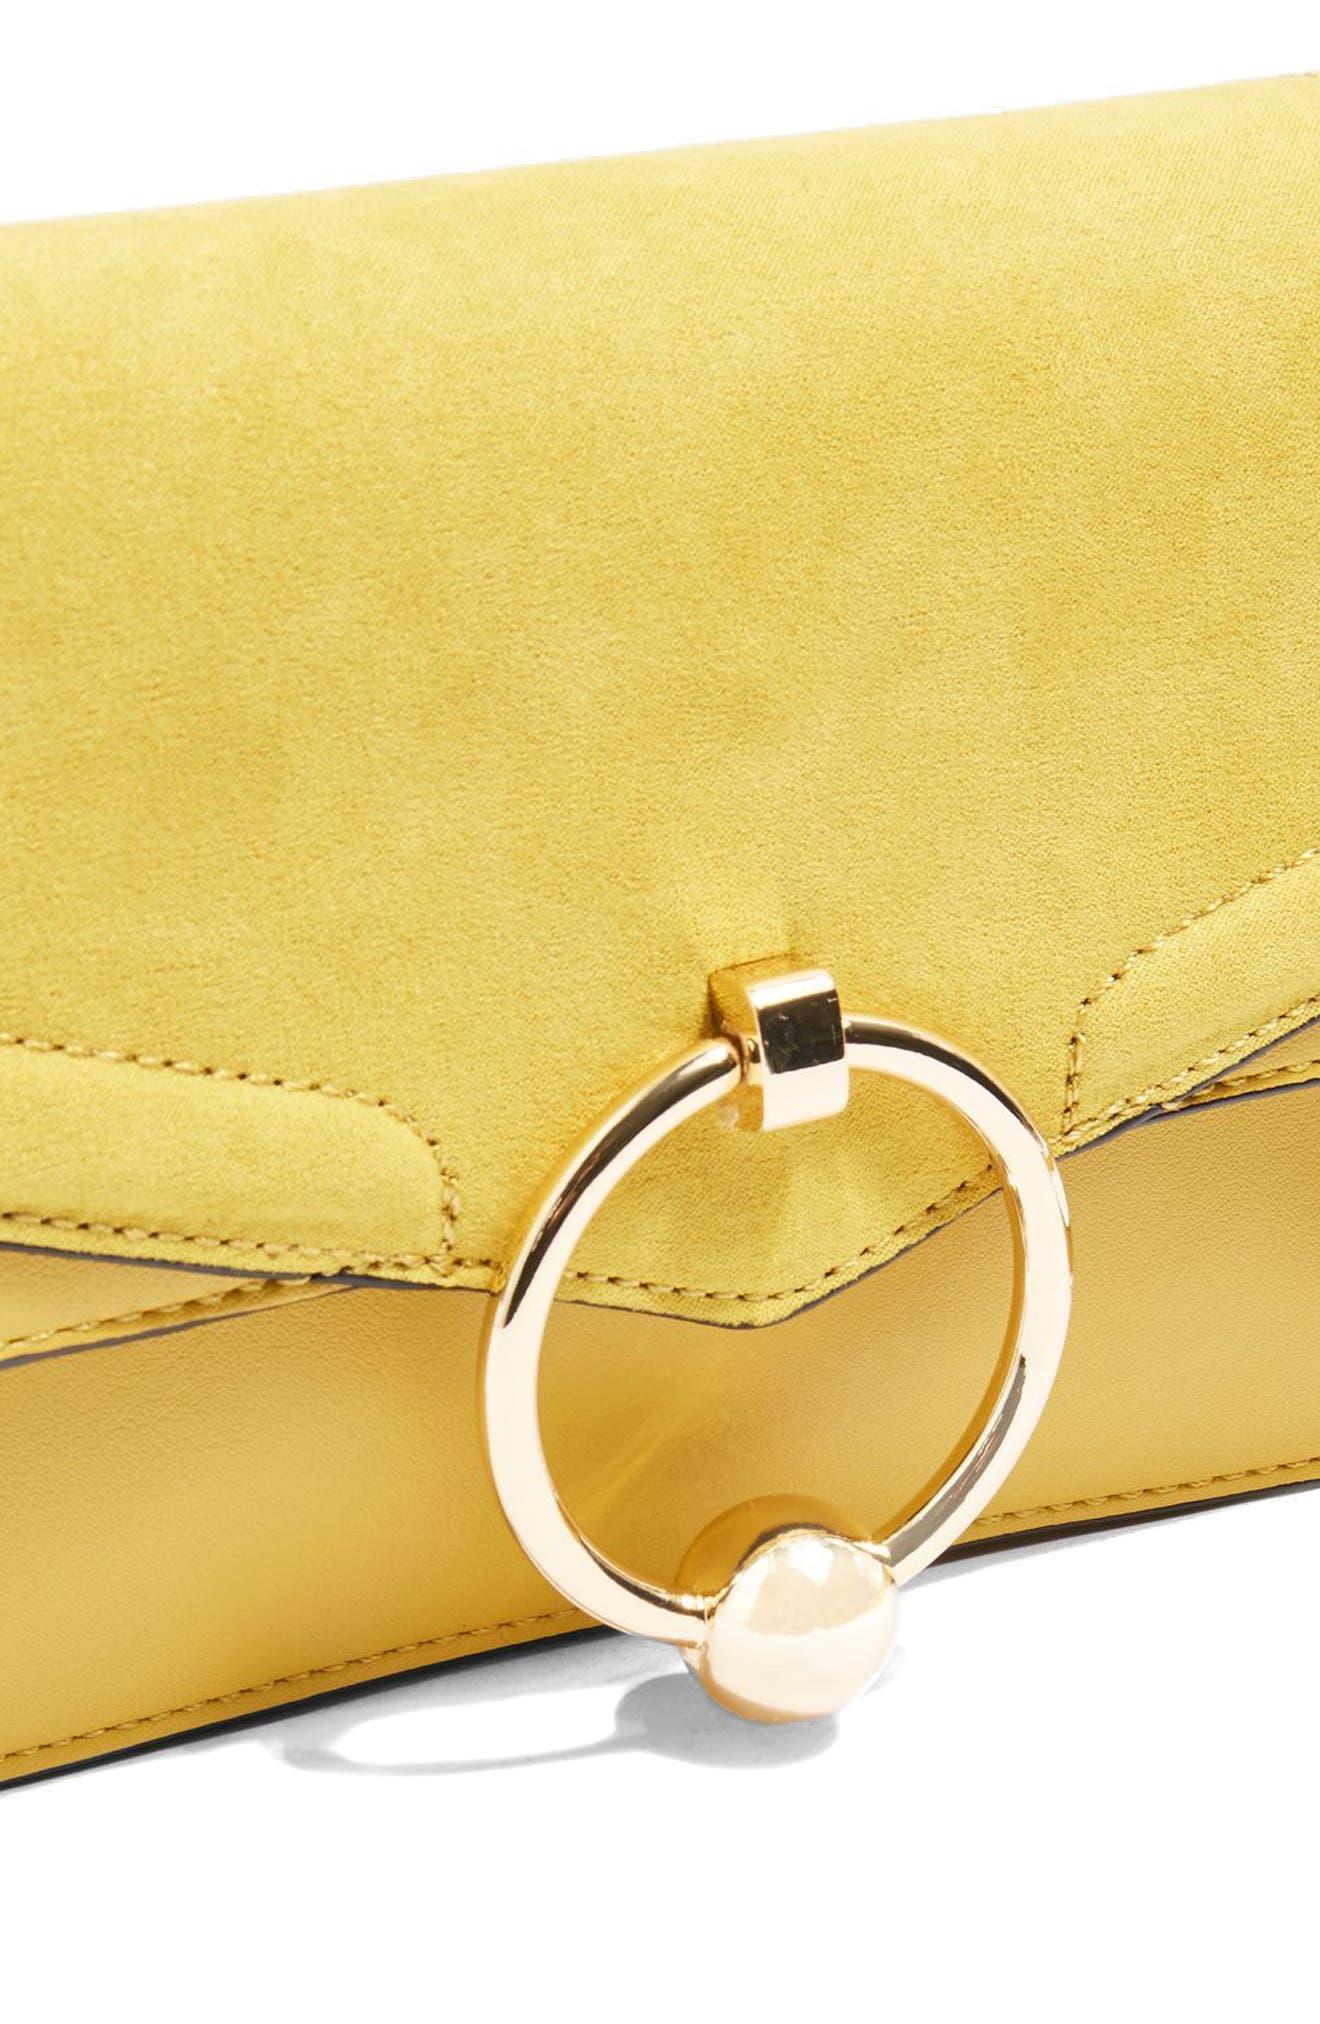 Seline Faux Leather Crossbody Bag,                             Alternate thumbnail 9, color,                             Yellow Multi